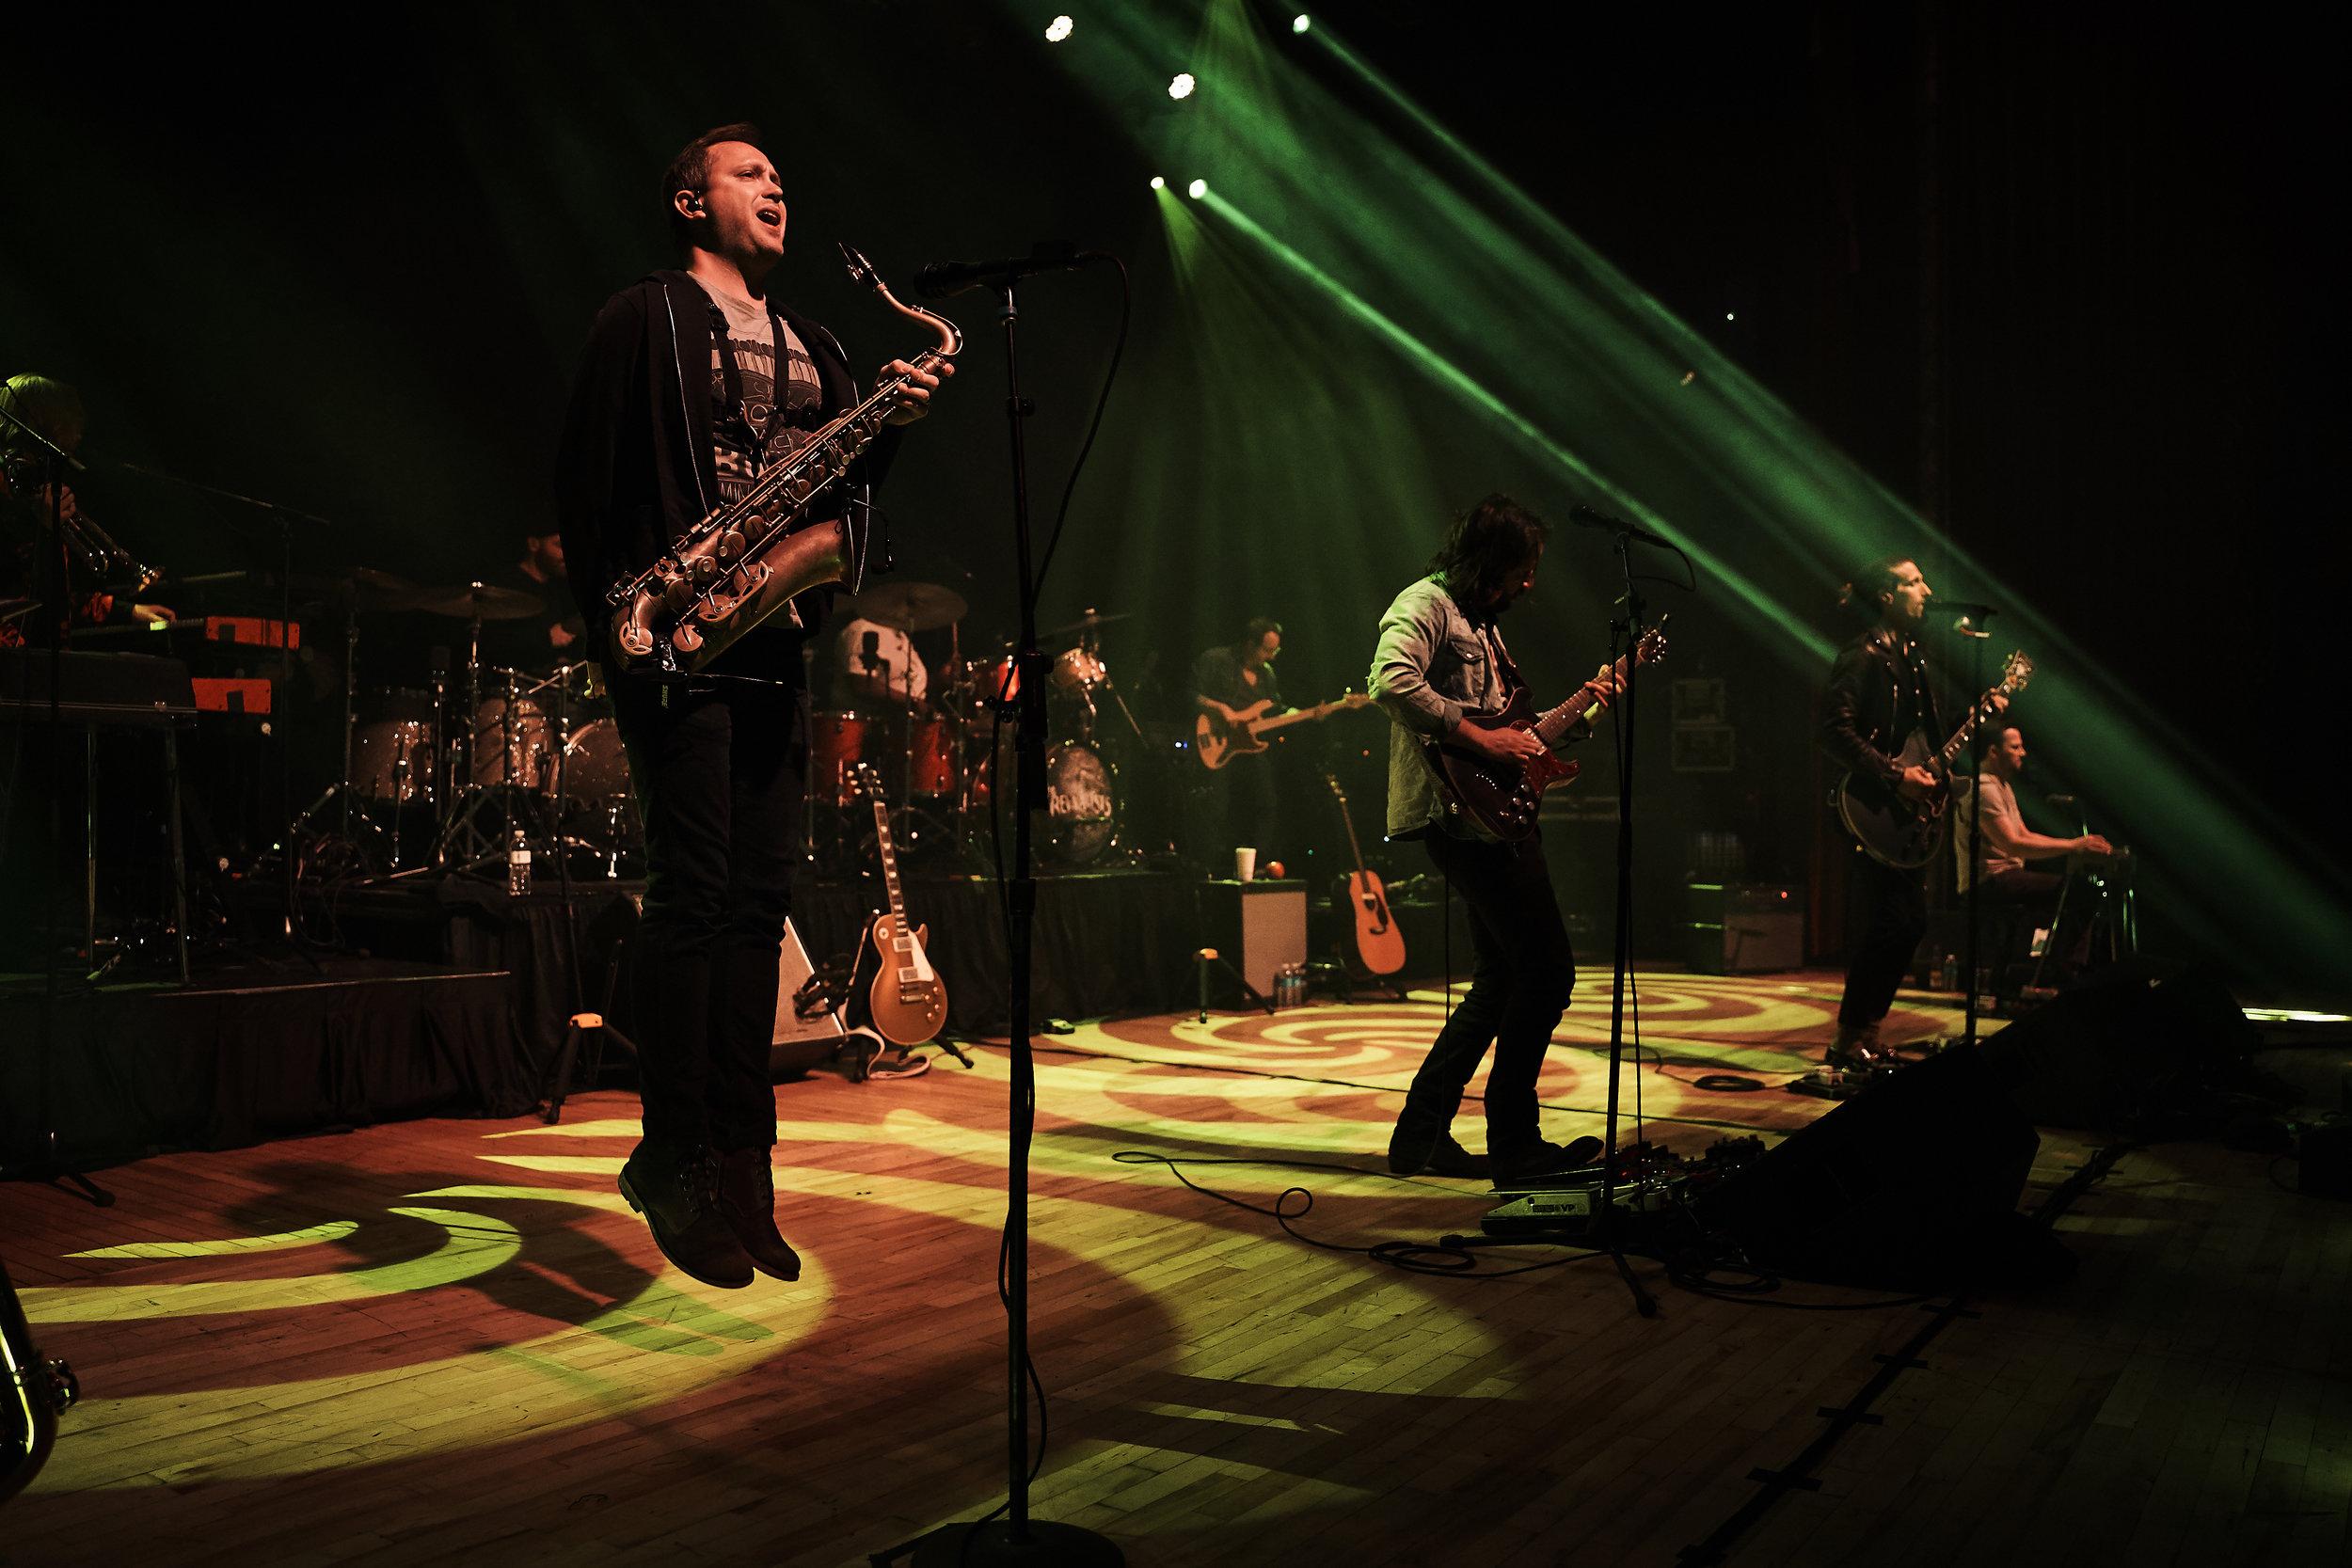 The Revivalists   // 2019-04-20 //   Royal Oak Music Theatre   - Royal Oak, MI // Photos by  Attila Hardy